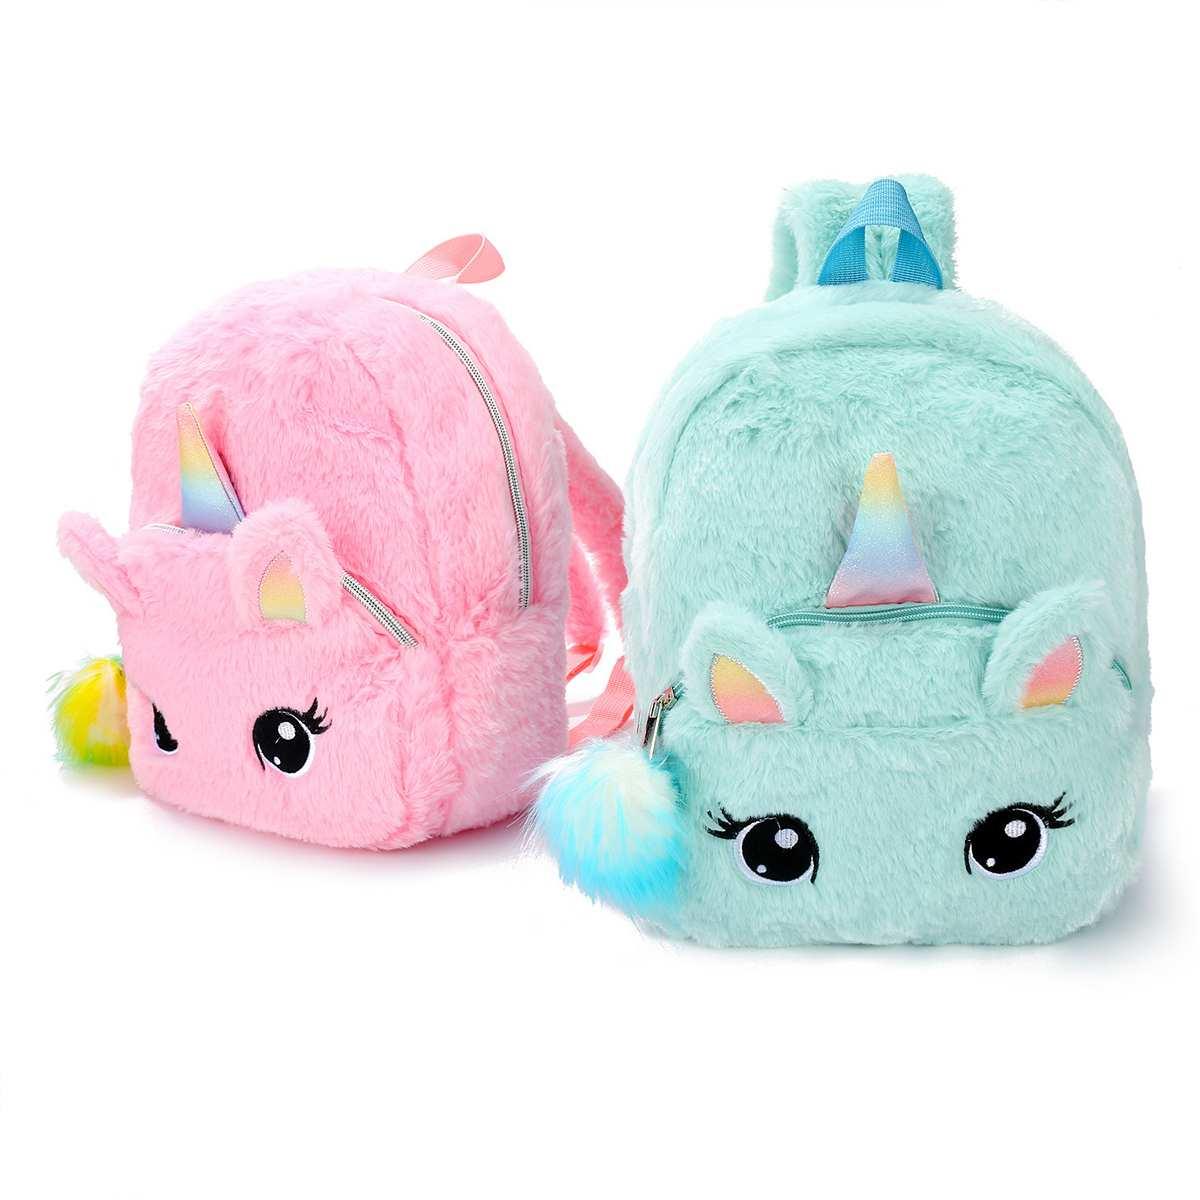 Unicorns Cartoon School Book Bag Backpacks Cute Fashion Fur Backpacks For Girls Travel Backpack Children Schoolbag Kids Gift